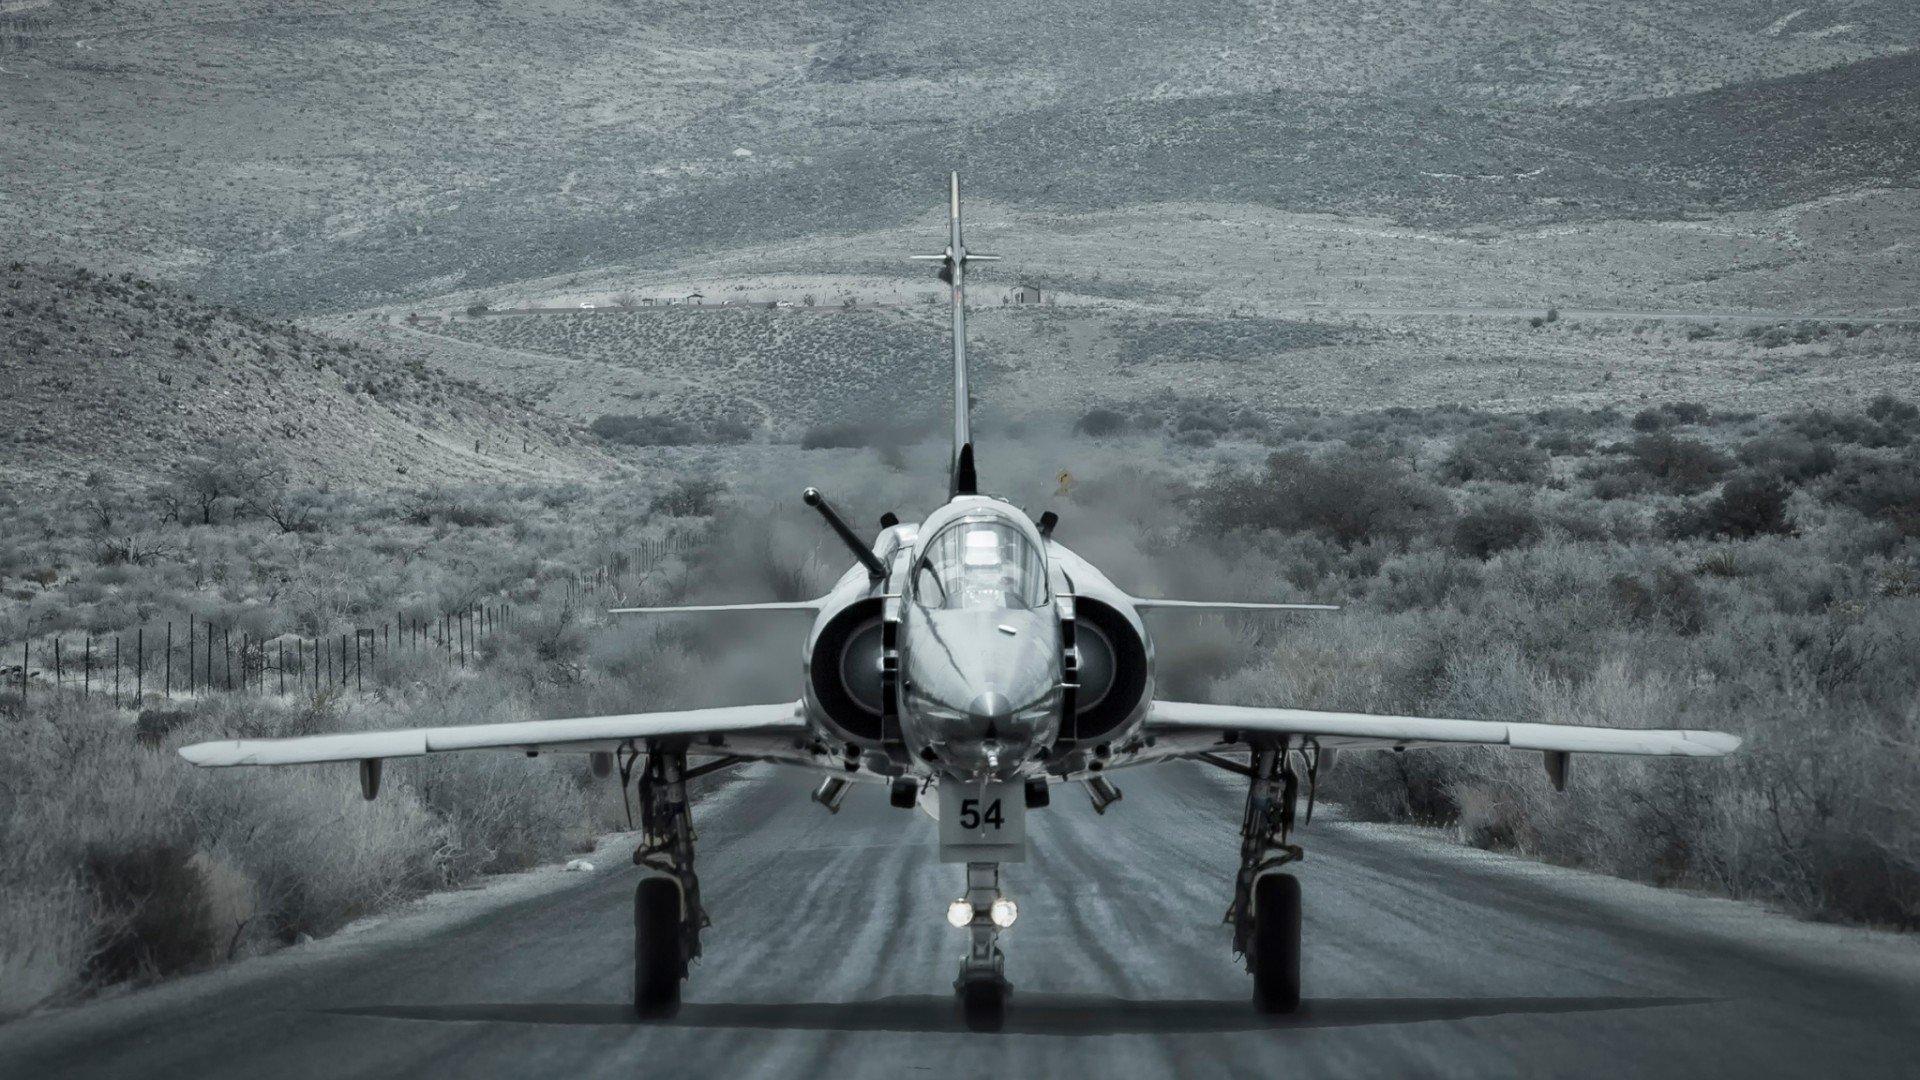 Mirage 2000 1367666 Hd Wallpaper Backgrounds Download